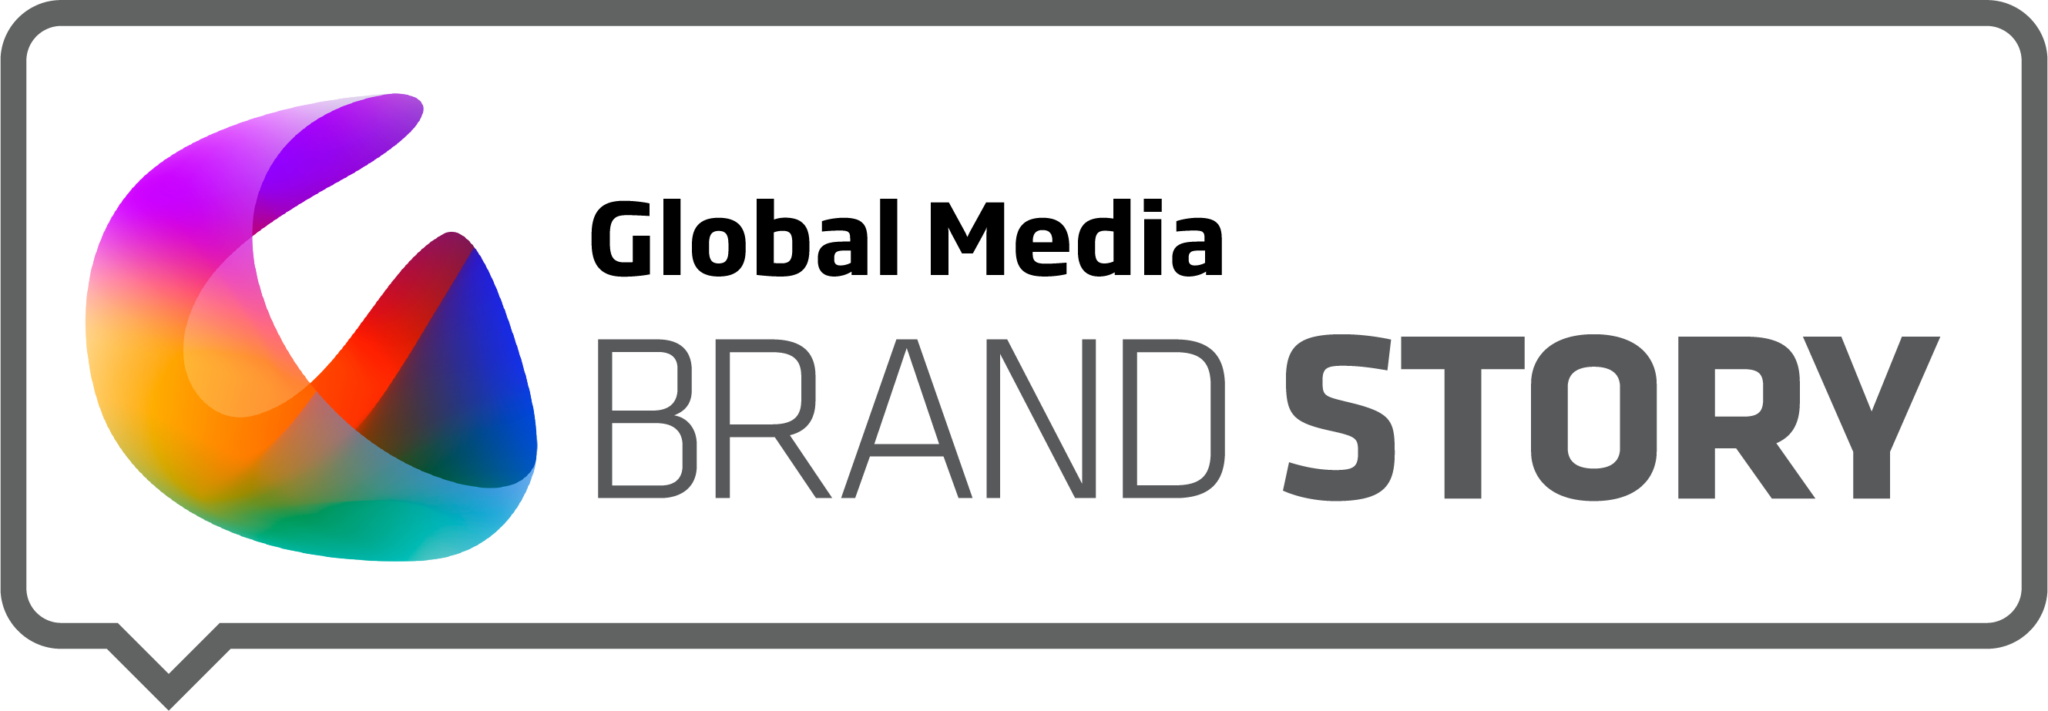 logo_GMG BRAND_STORY